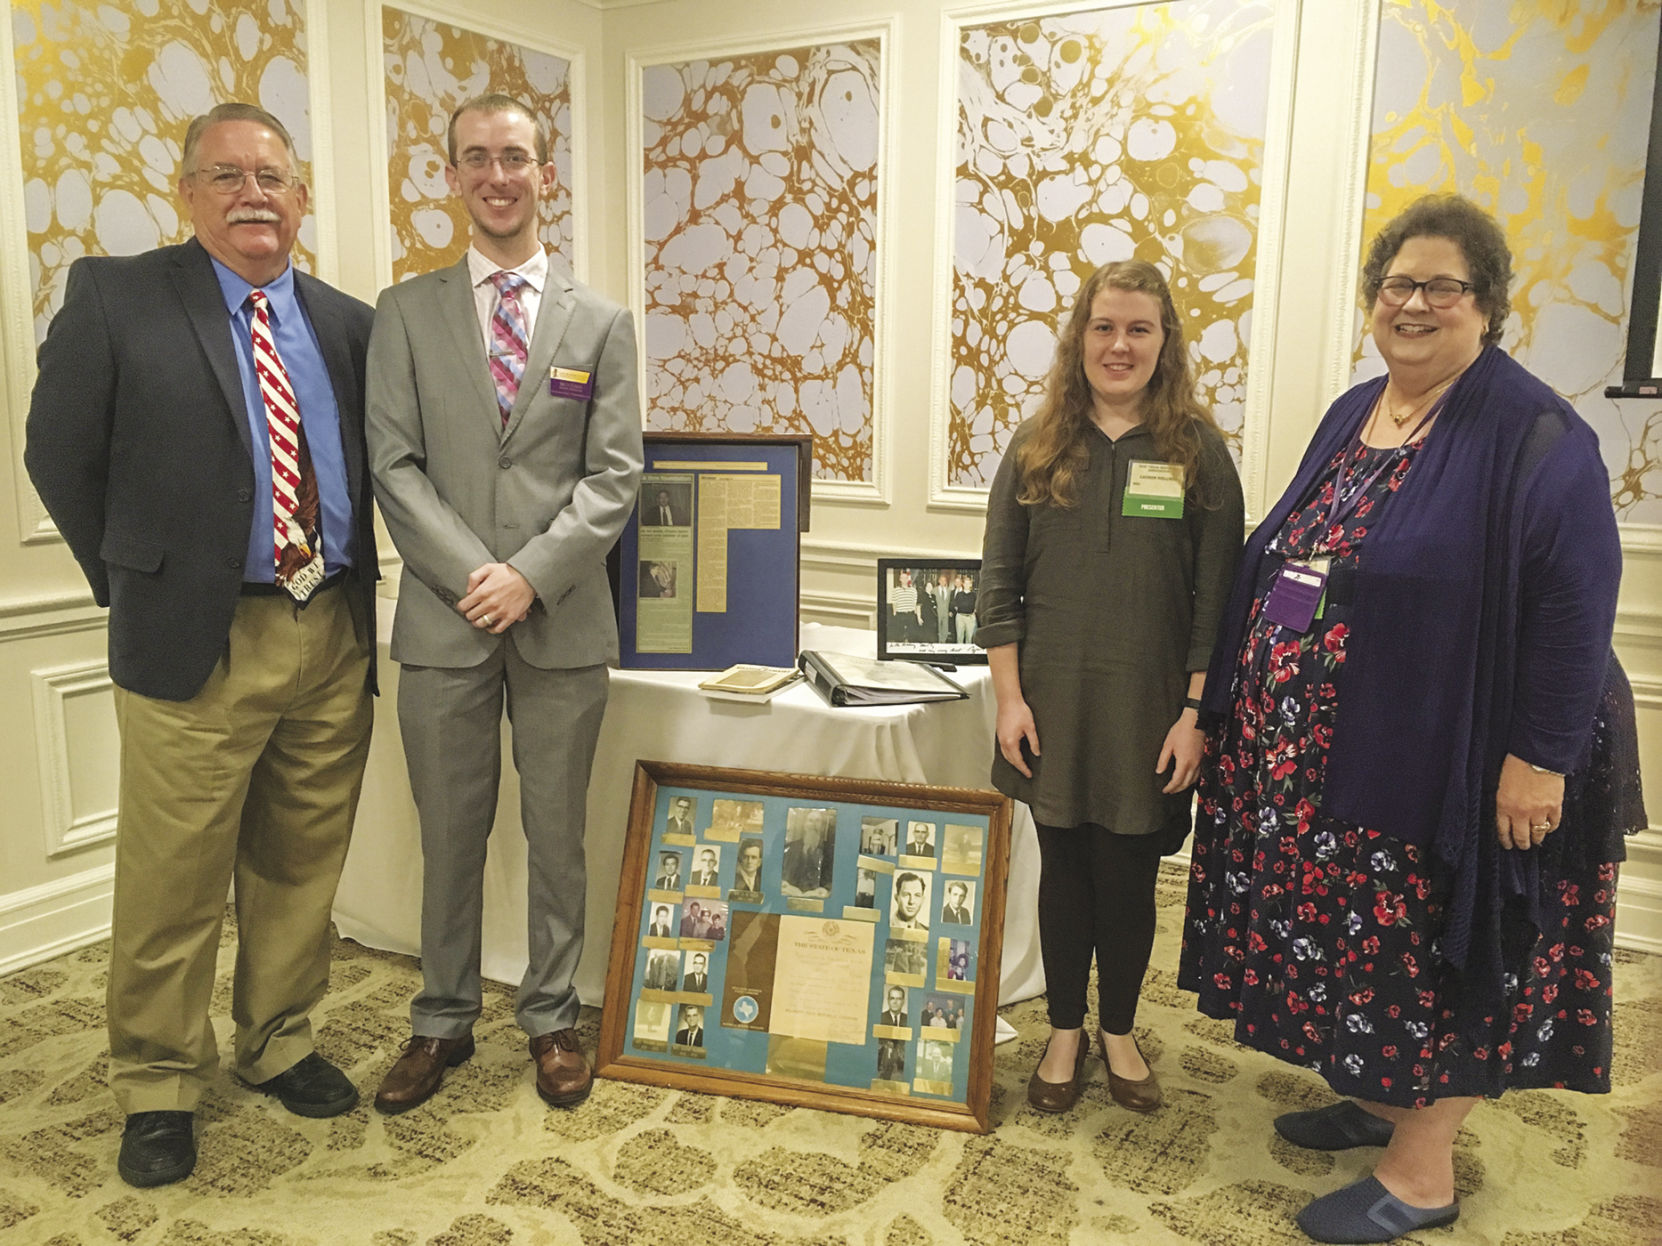 Jacksonville College presents at annual ETHA meeting | Jacksonville Progress